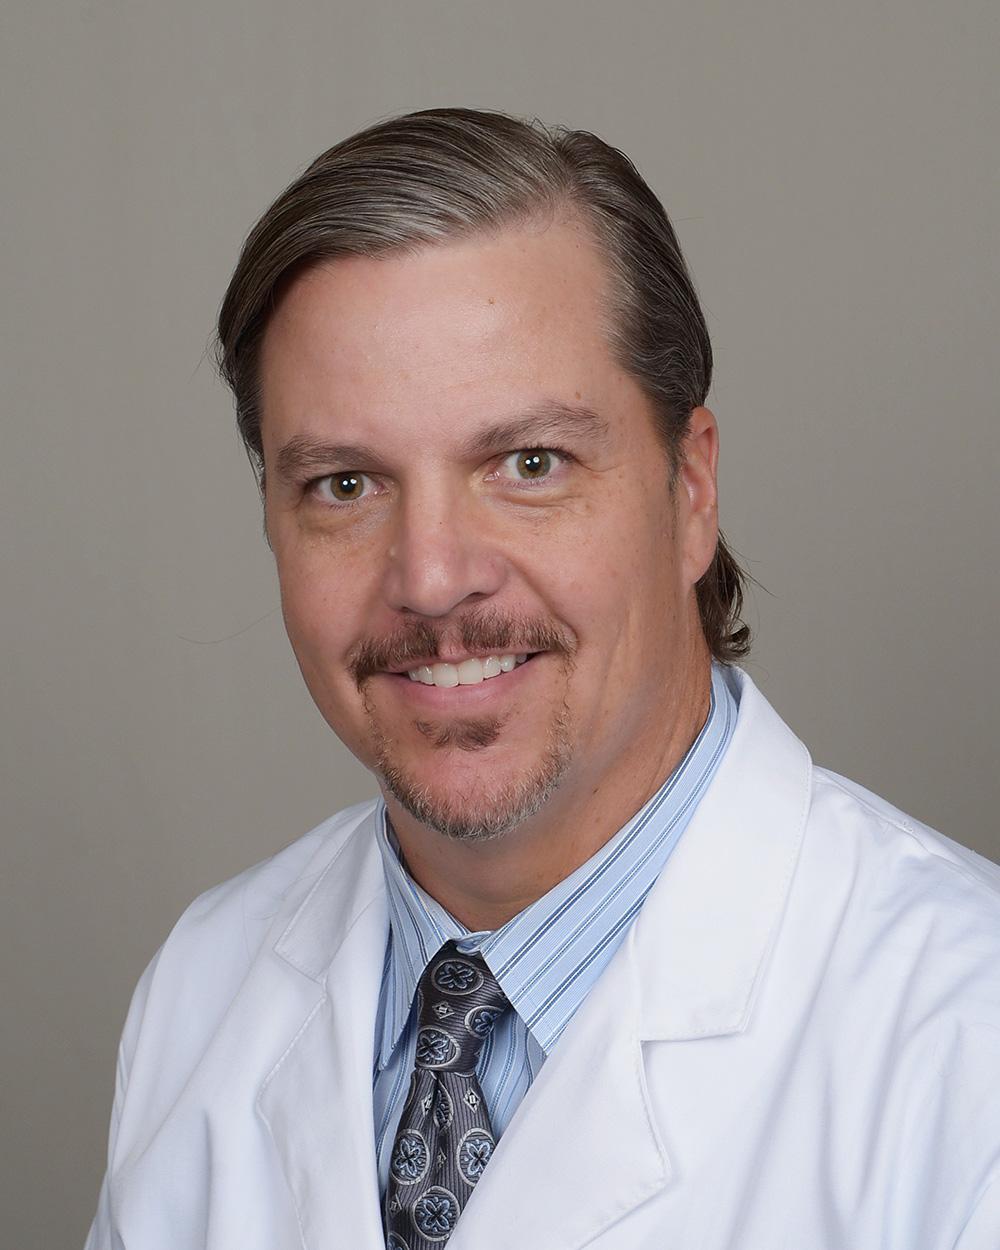 Profile Photo of Dr. Joe Mayes II - None